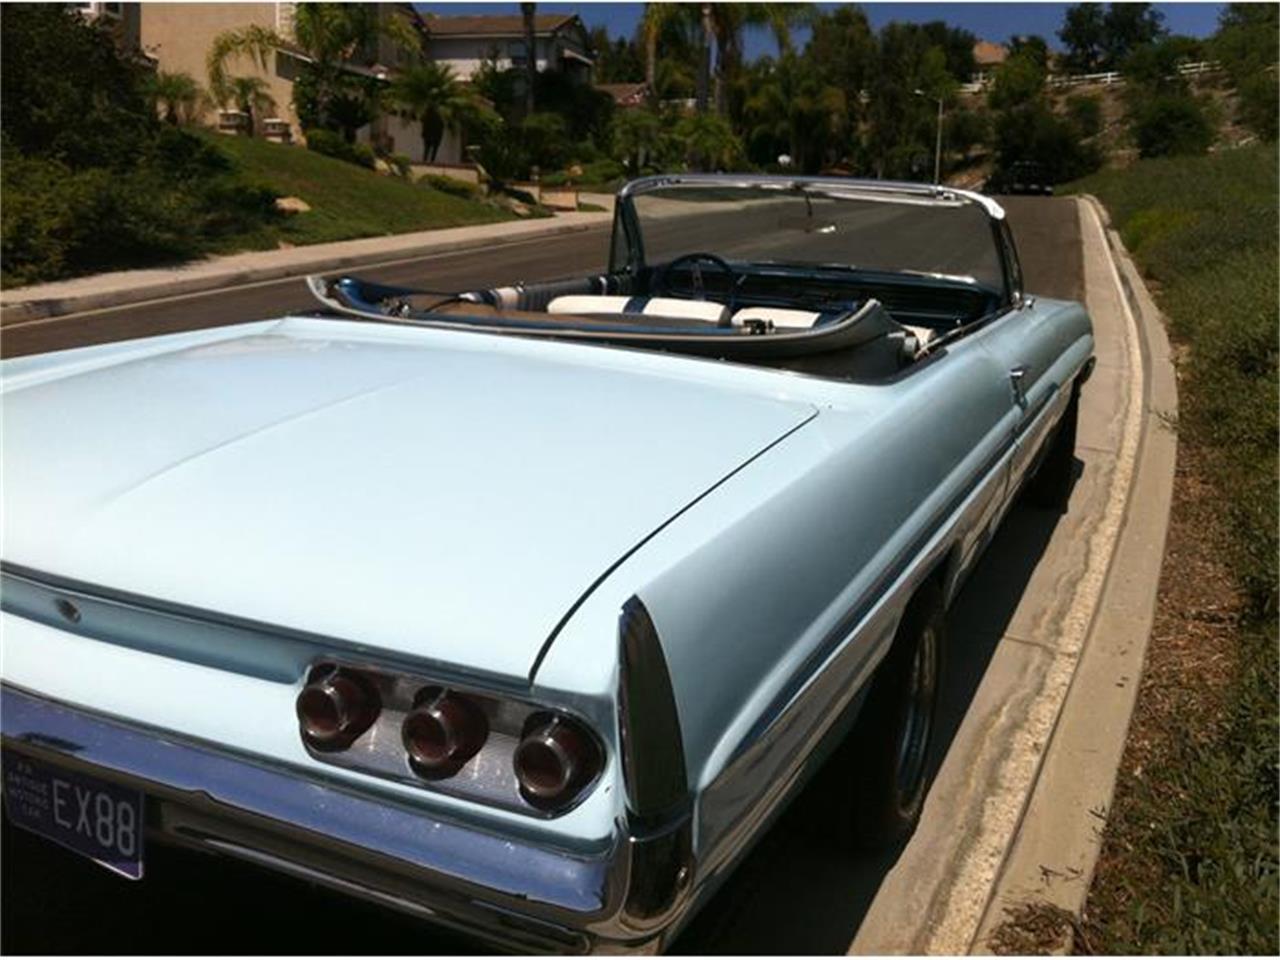 Large Picture of '61 Pontiac Bonneville located in Cot de Caza California - ASQZ